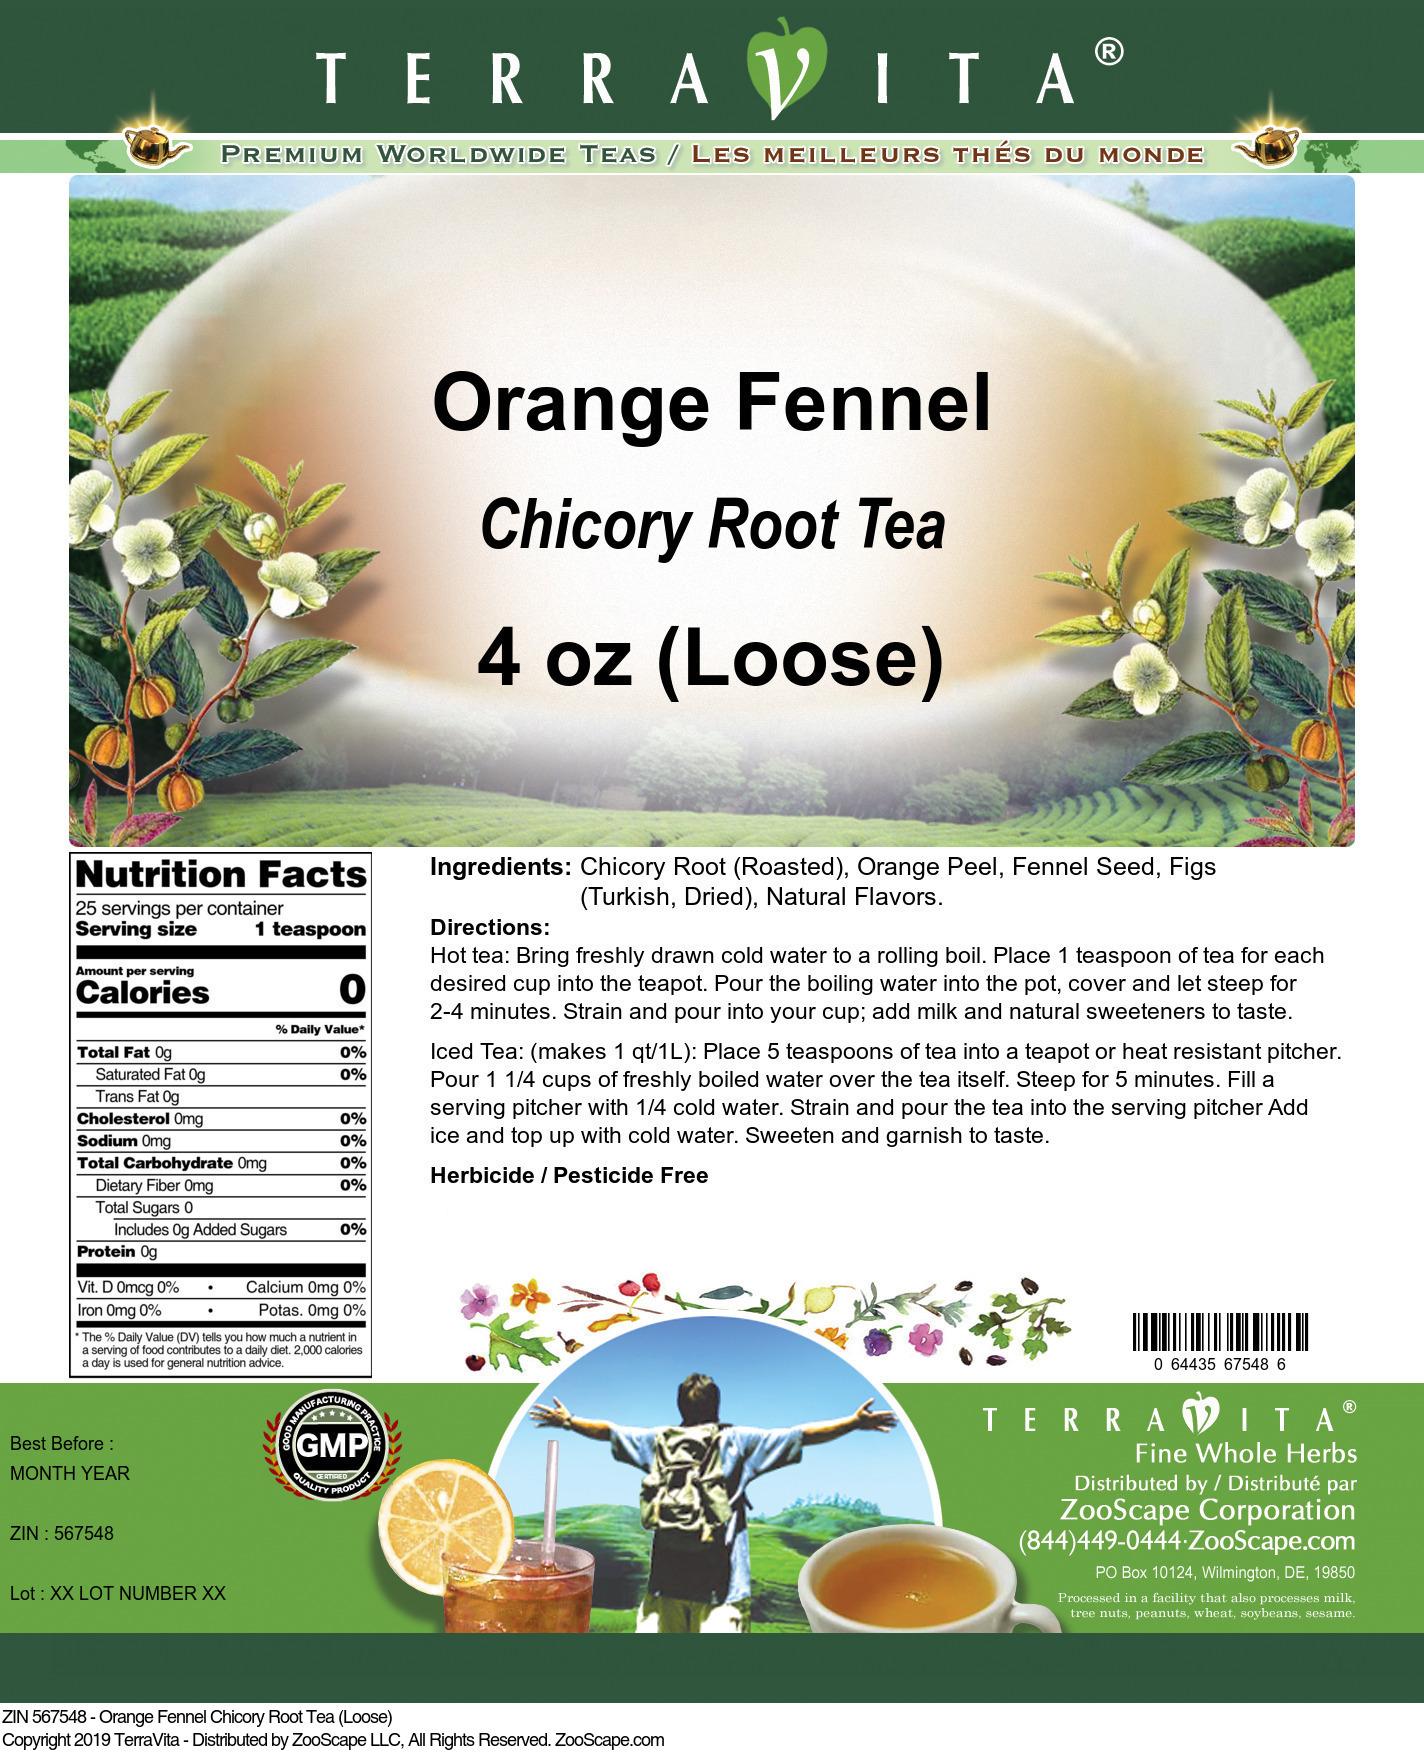 Orange Fennel Chicory Root